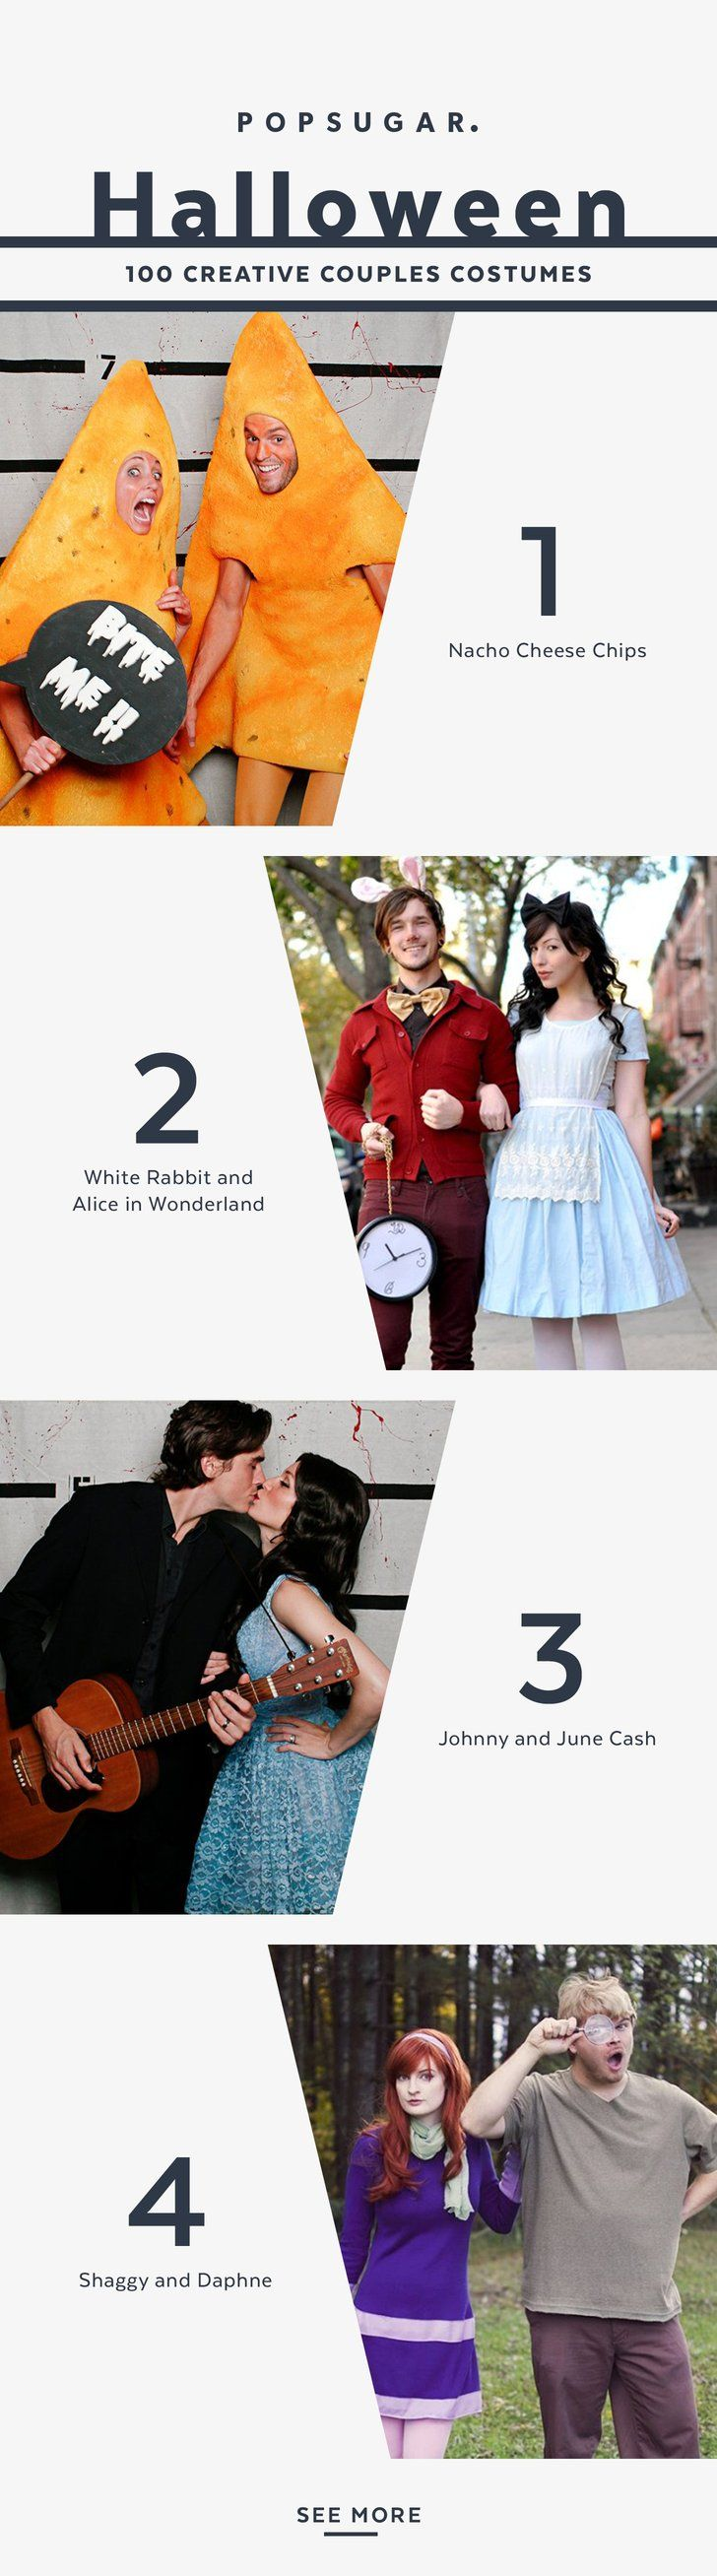 100 Creative Couples Costume Ideas